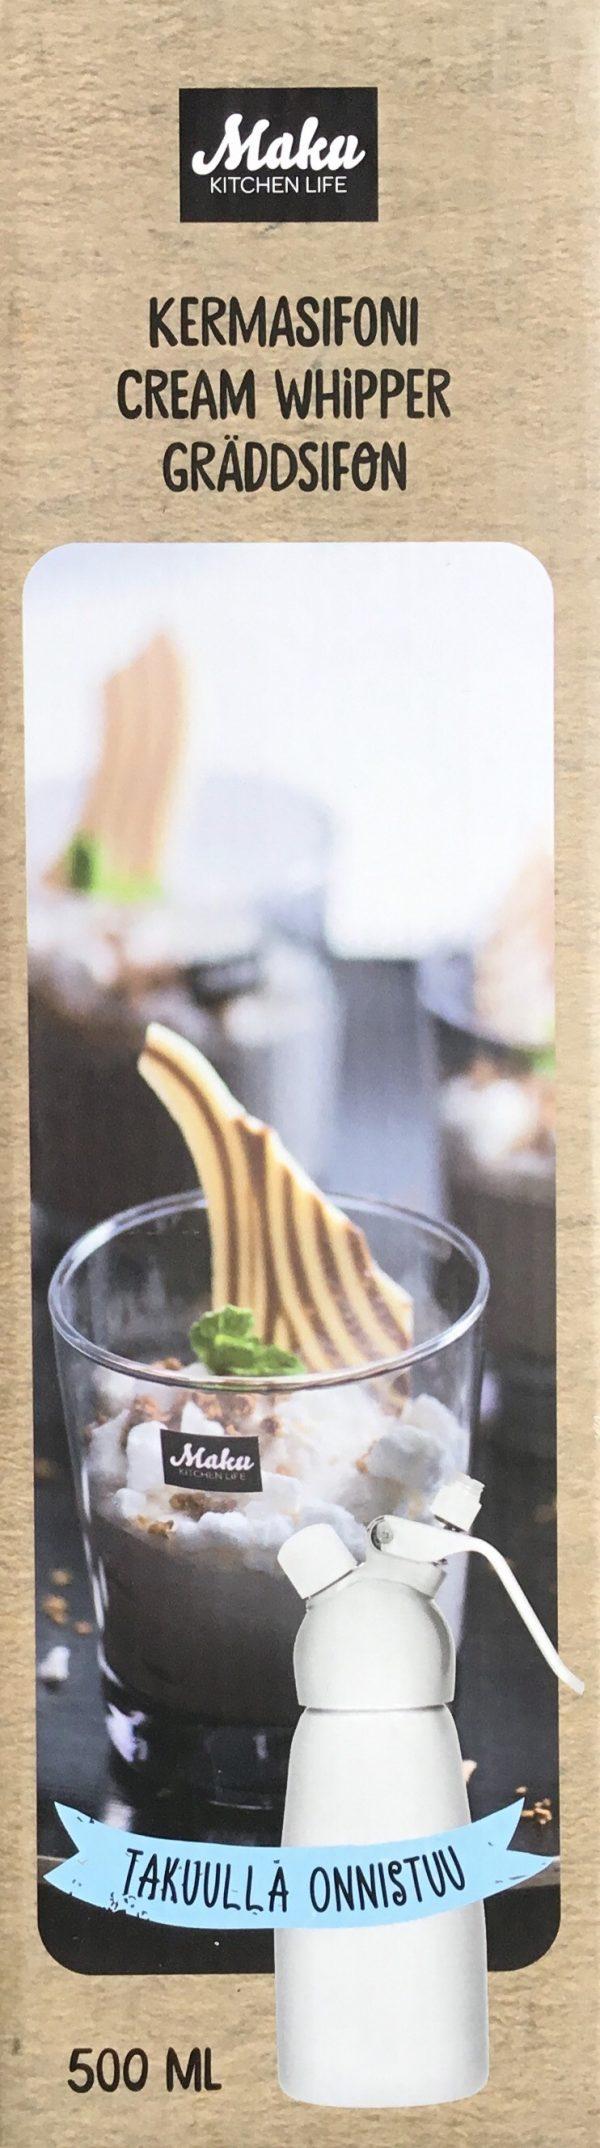 Sifón Maku para nata y espumas